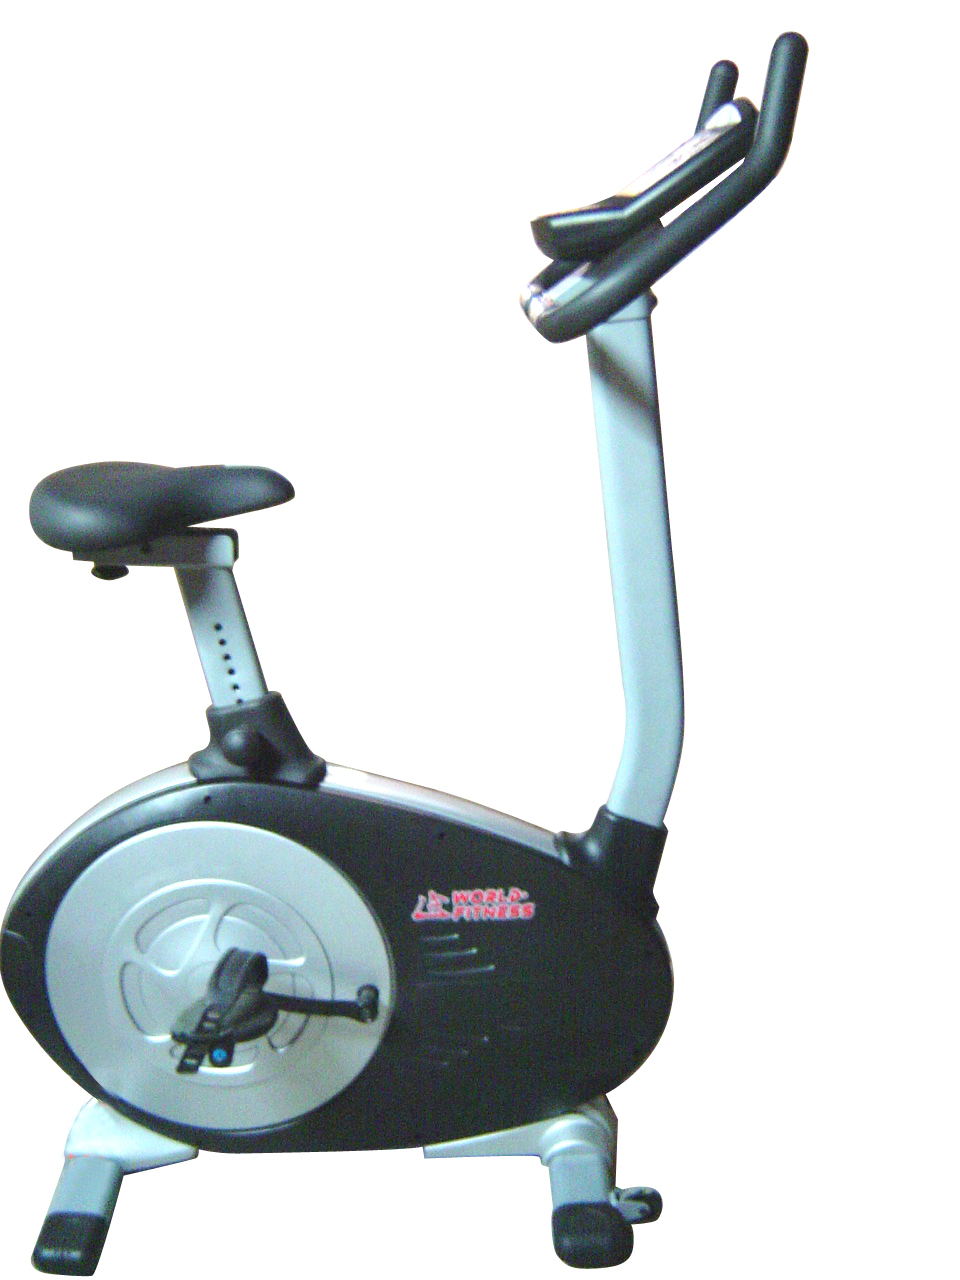 La bicicleta fija tonifica tus músculos